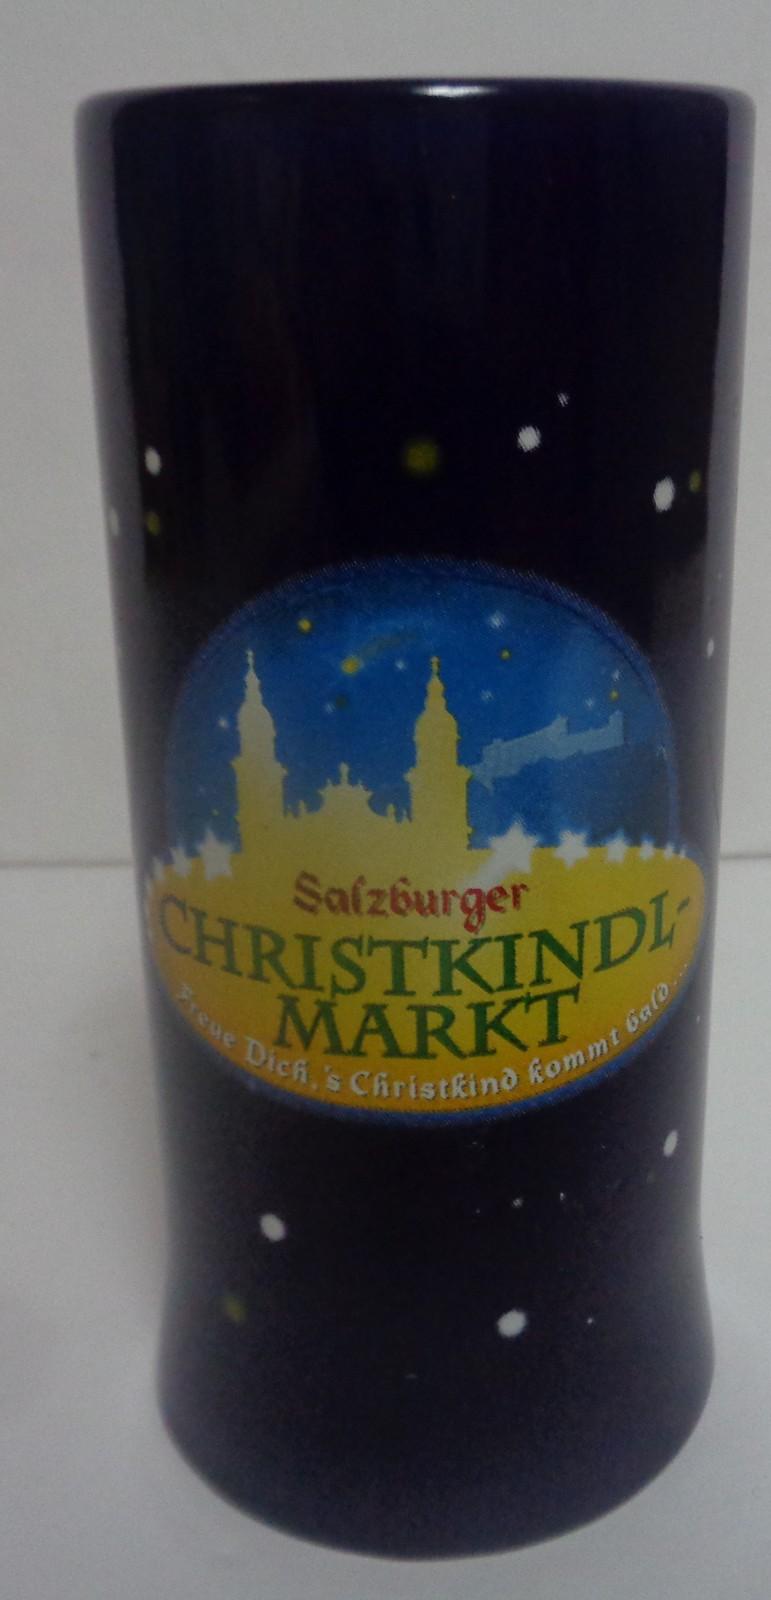 "Salzburger Christkindl German Beer Mug Glass 5.25"" Mohaba Company"